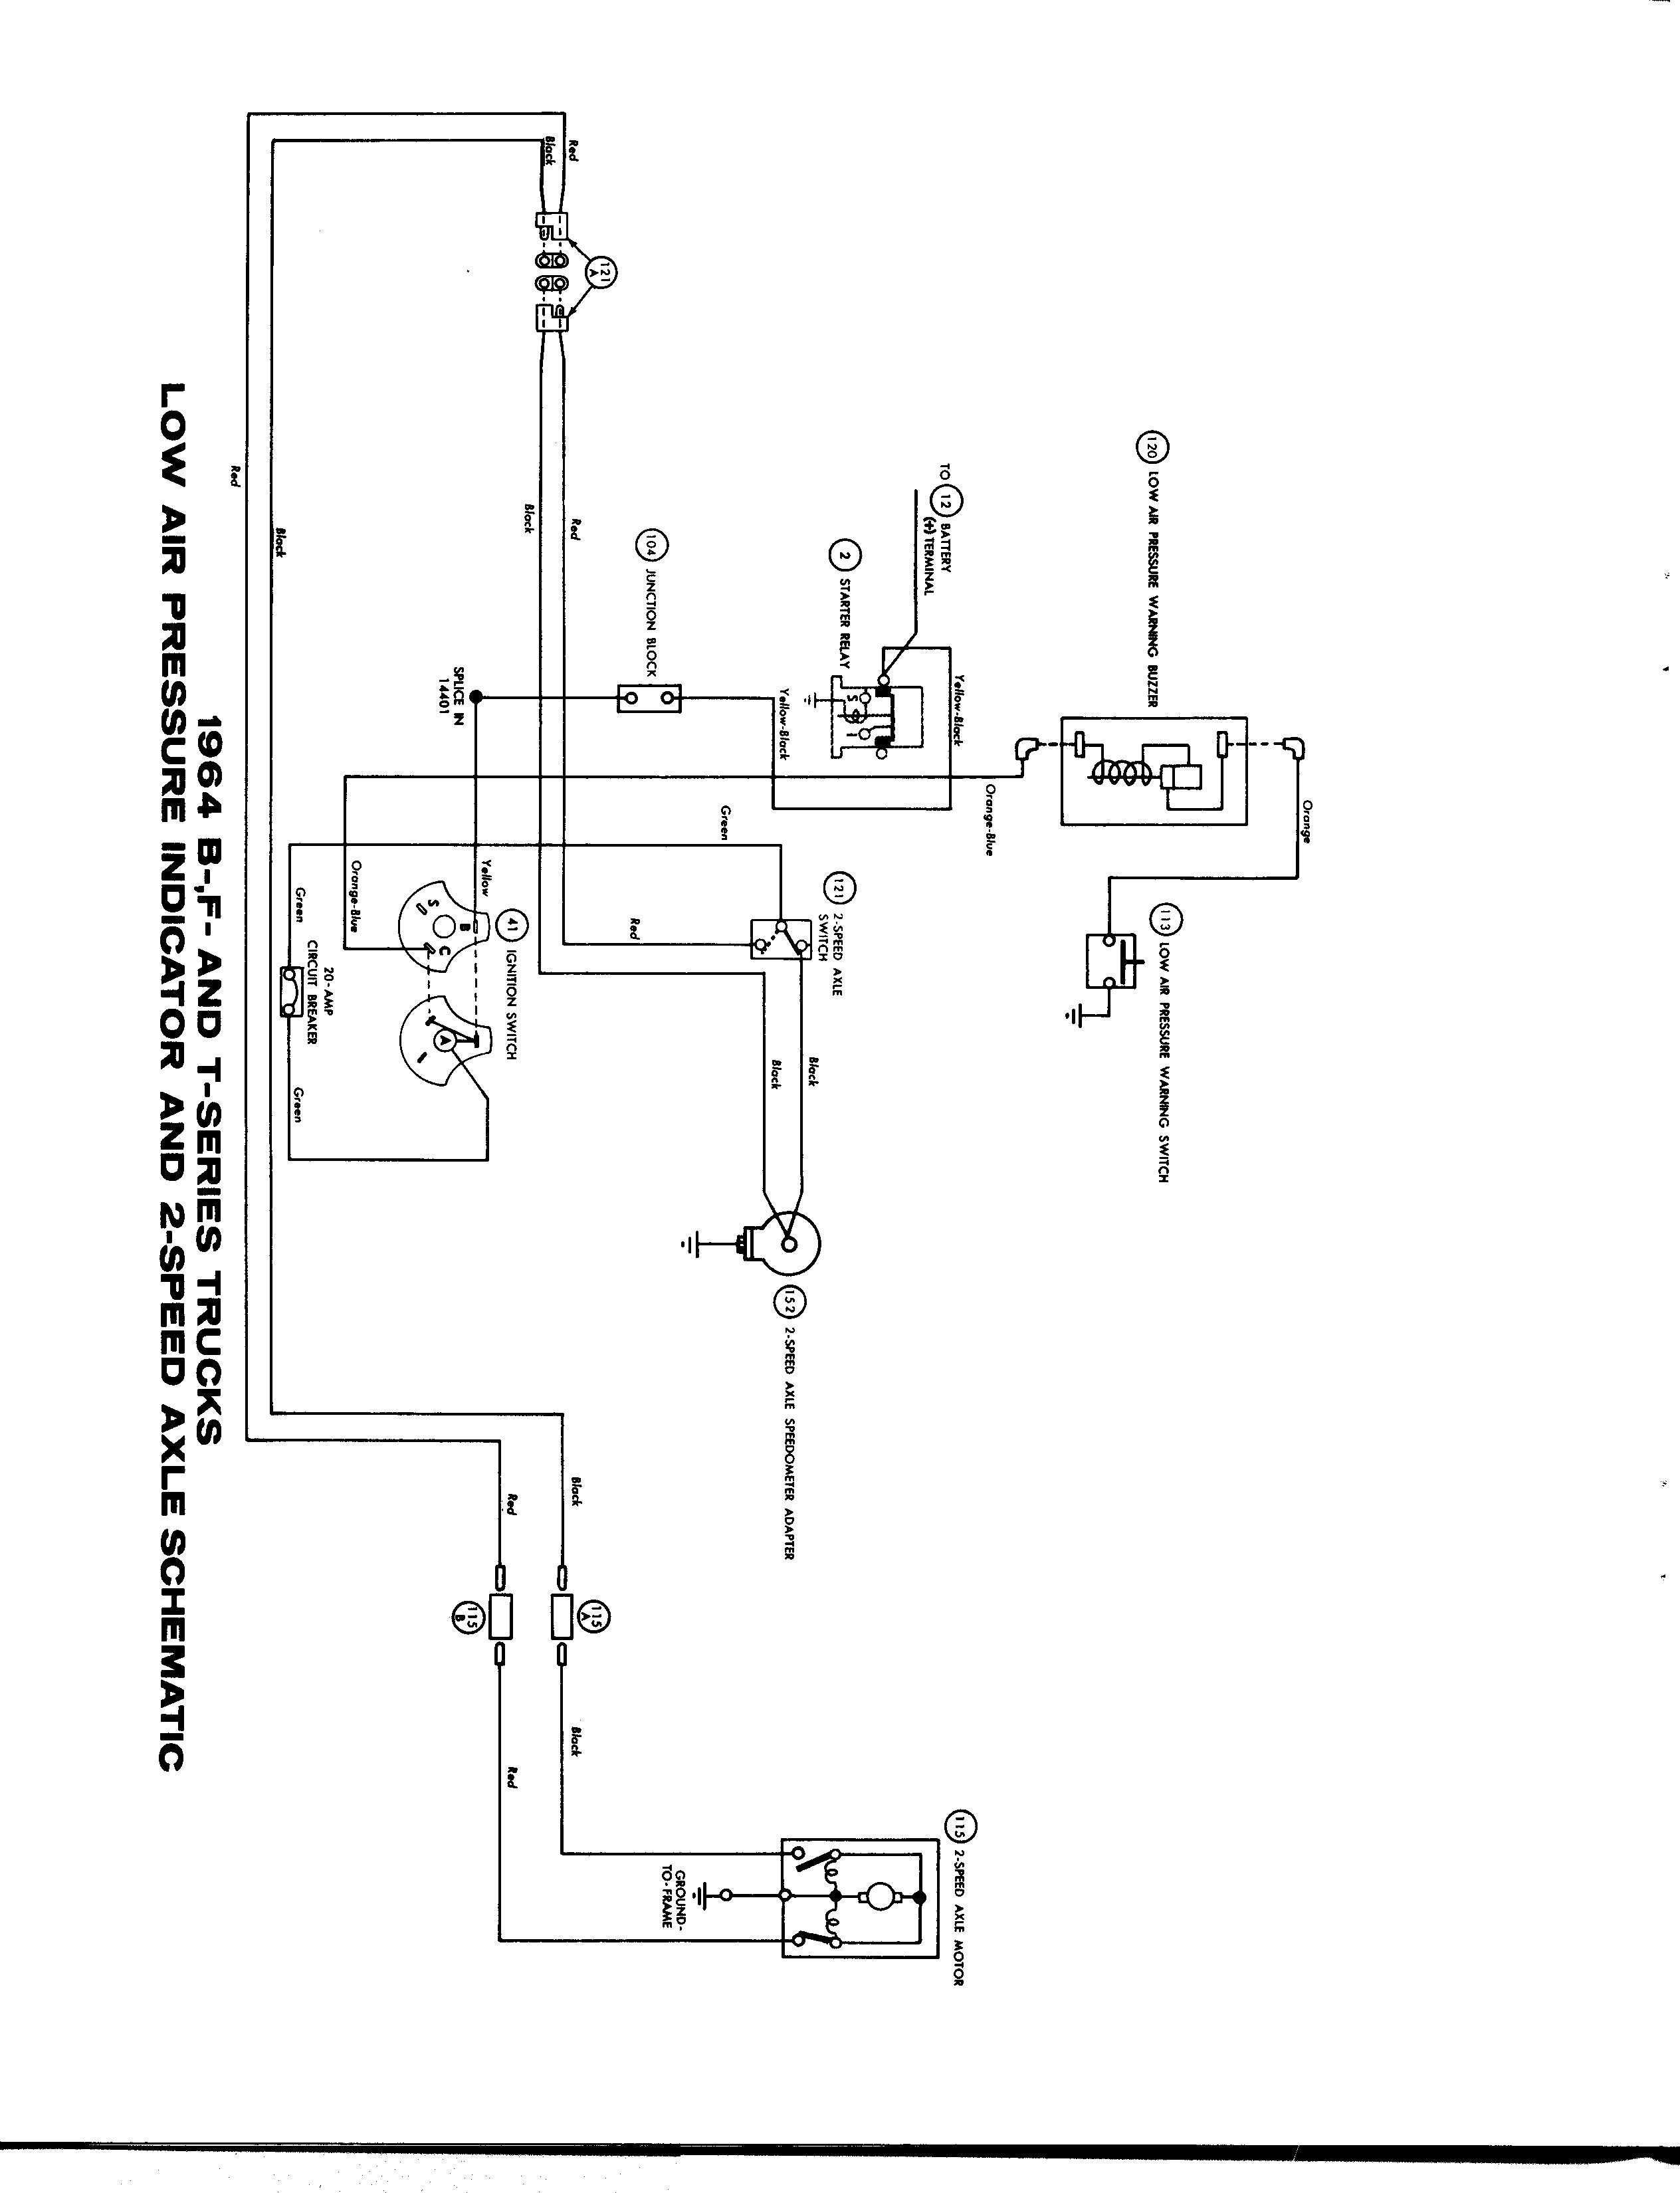 2001 honda civic coil wiring diagram